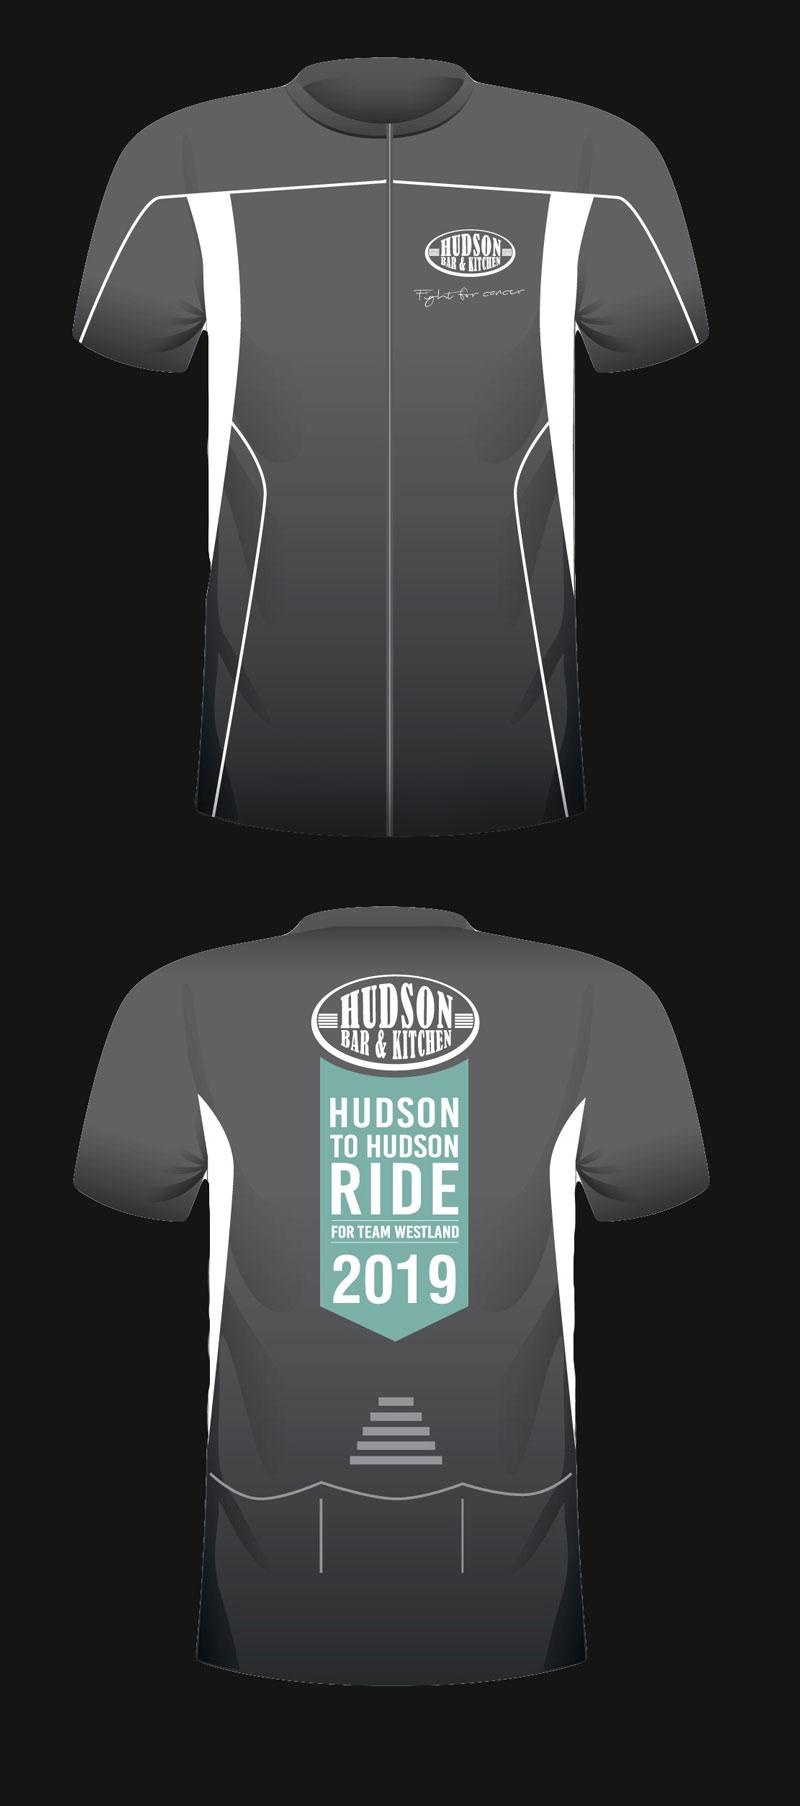 Hudson to Hudson Ride 2019 Shirts